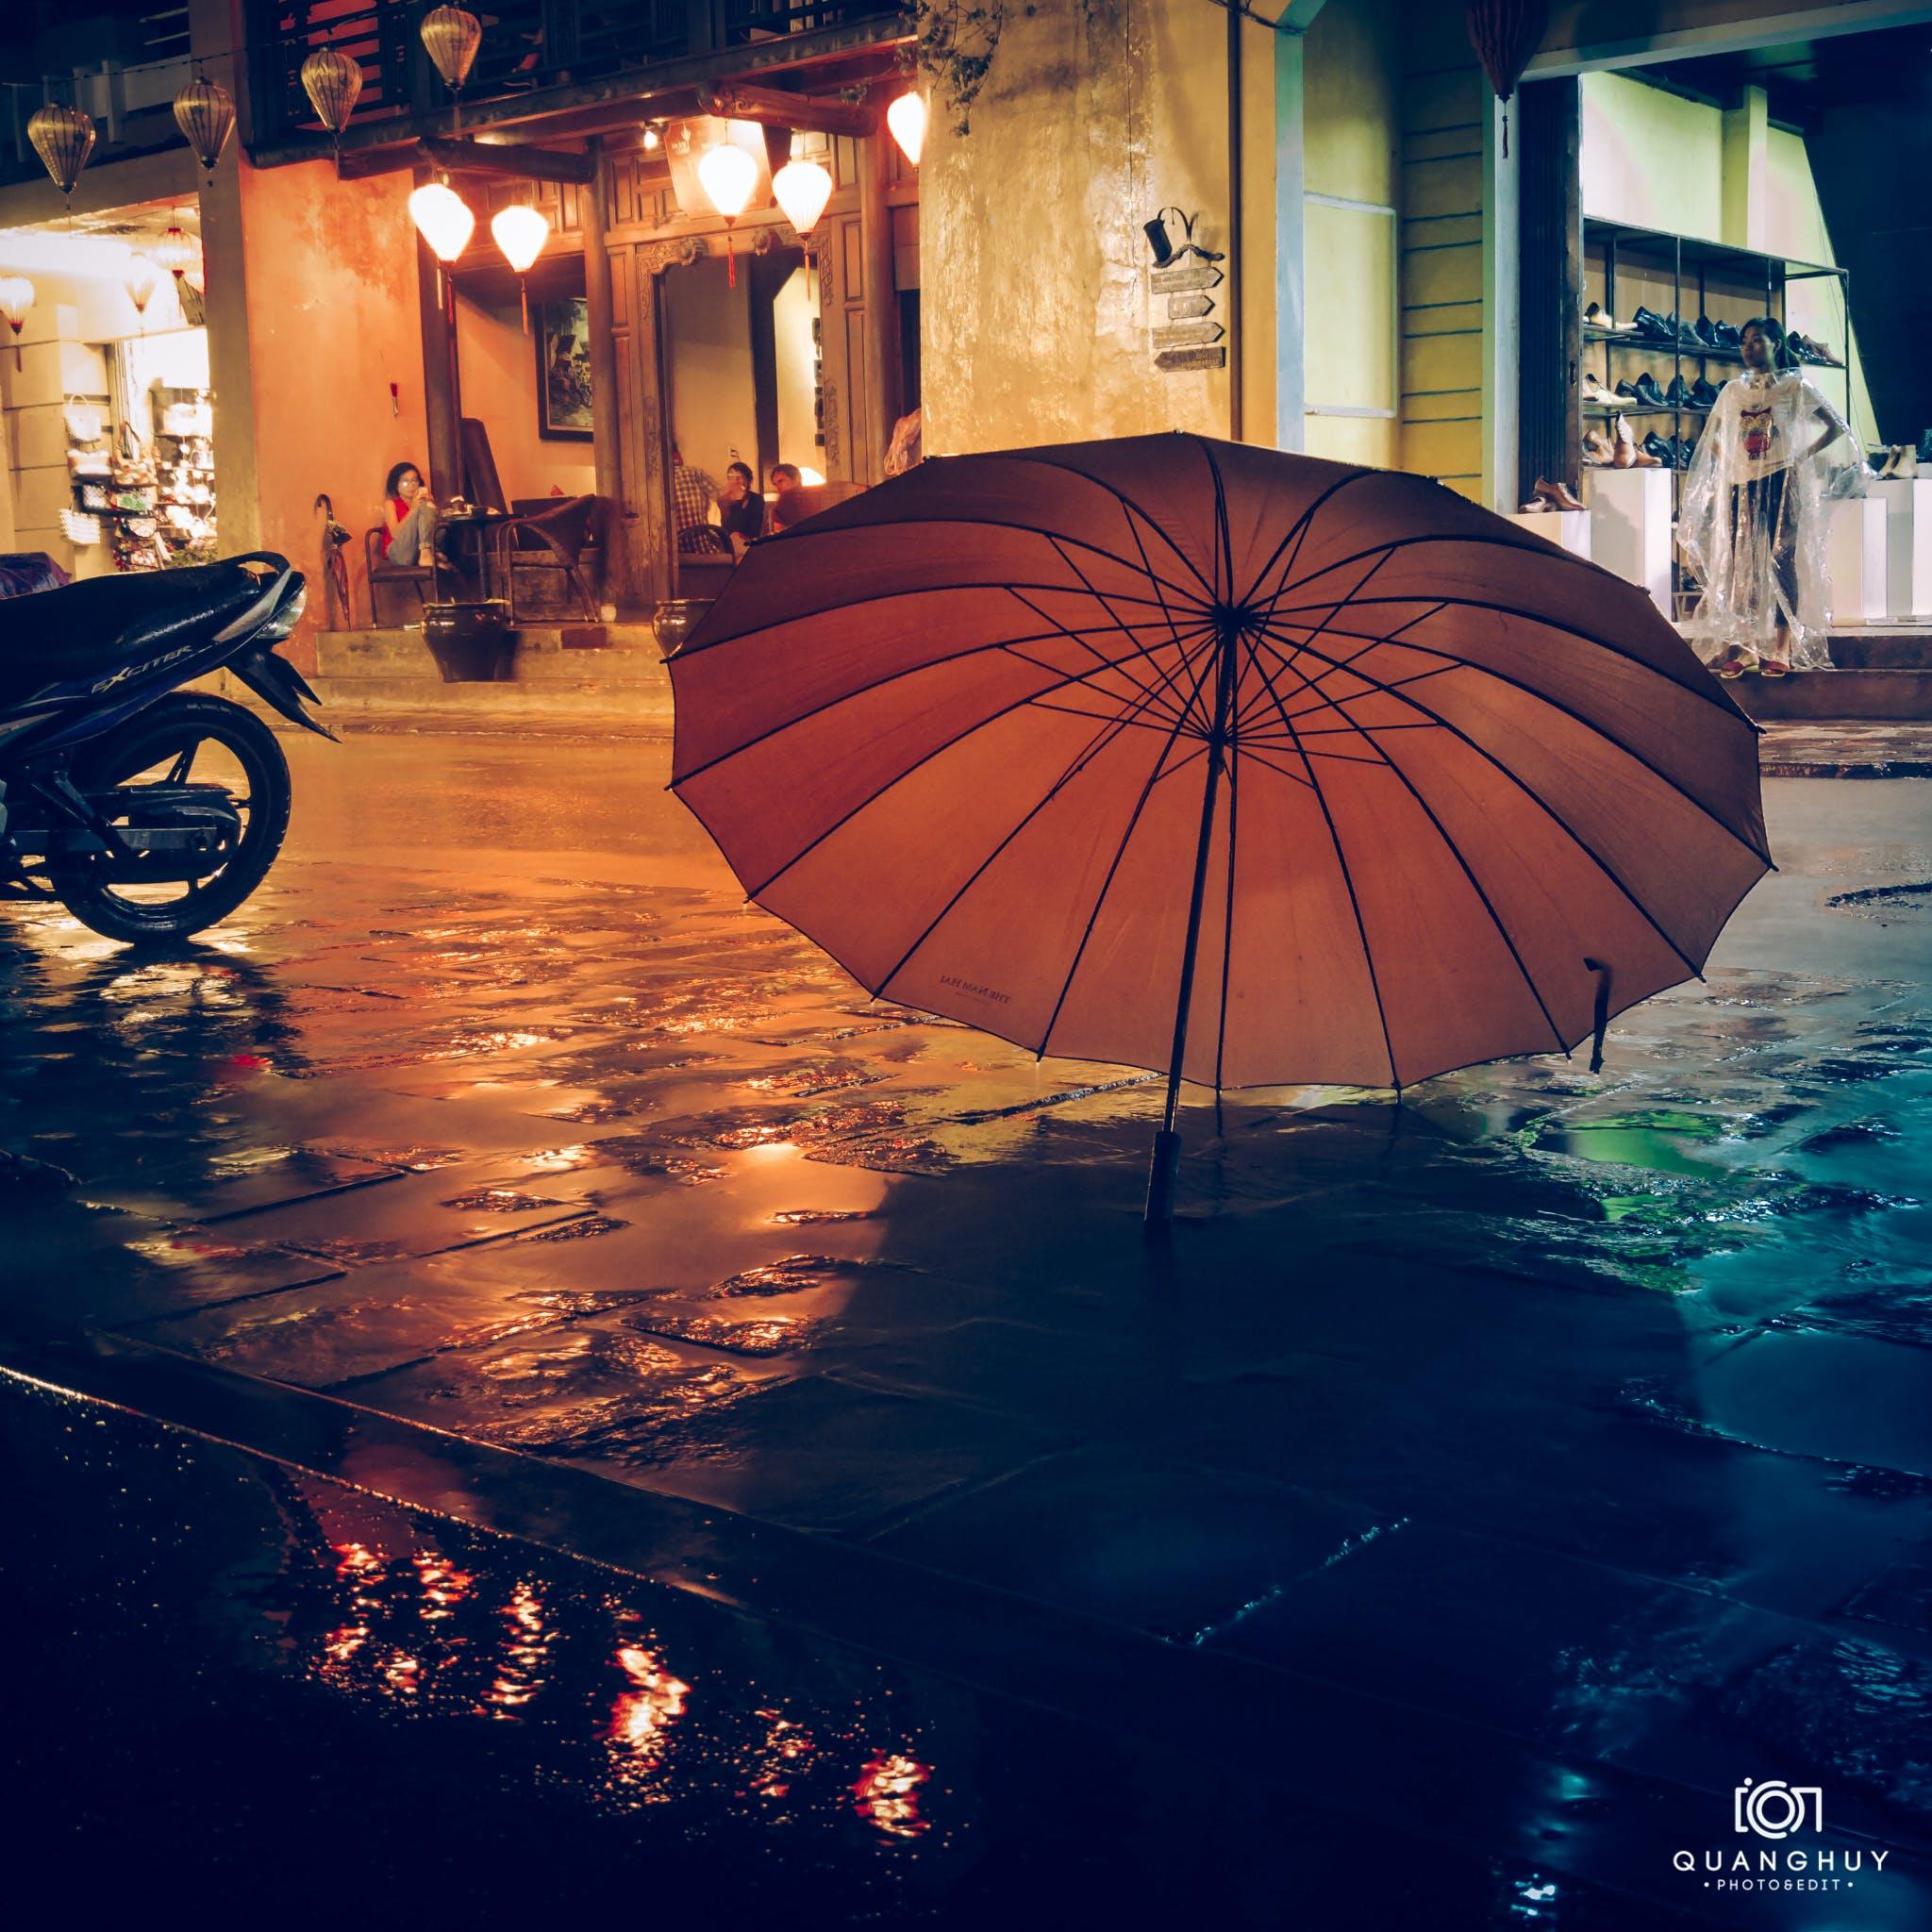 Free stock photo of hội an, lgg4, night, rain